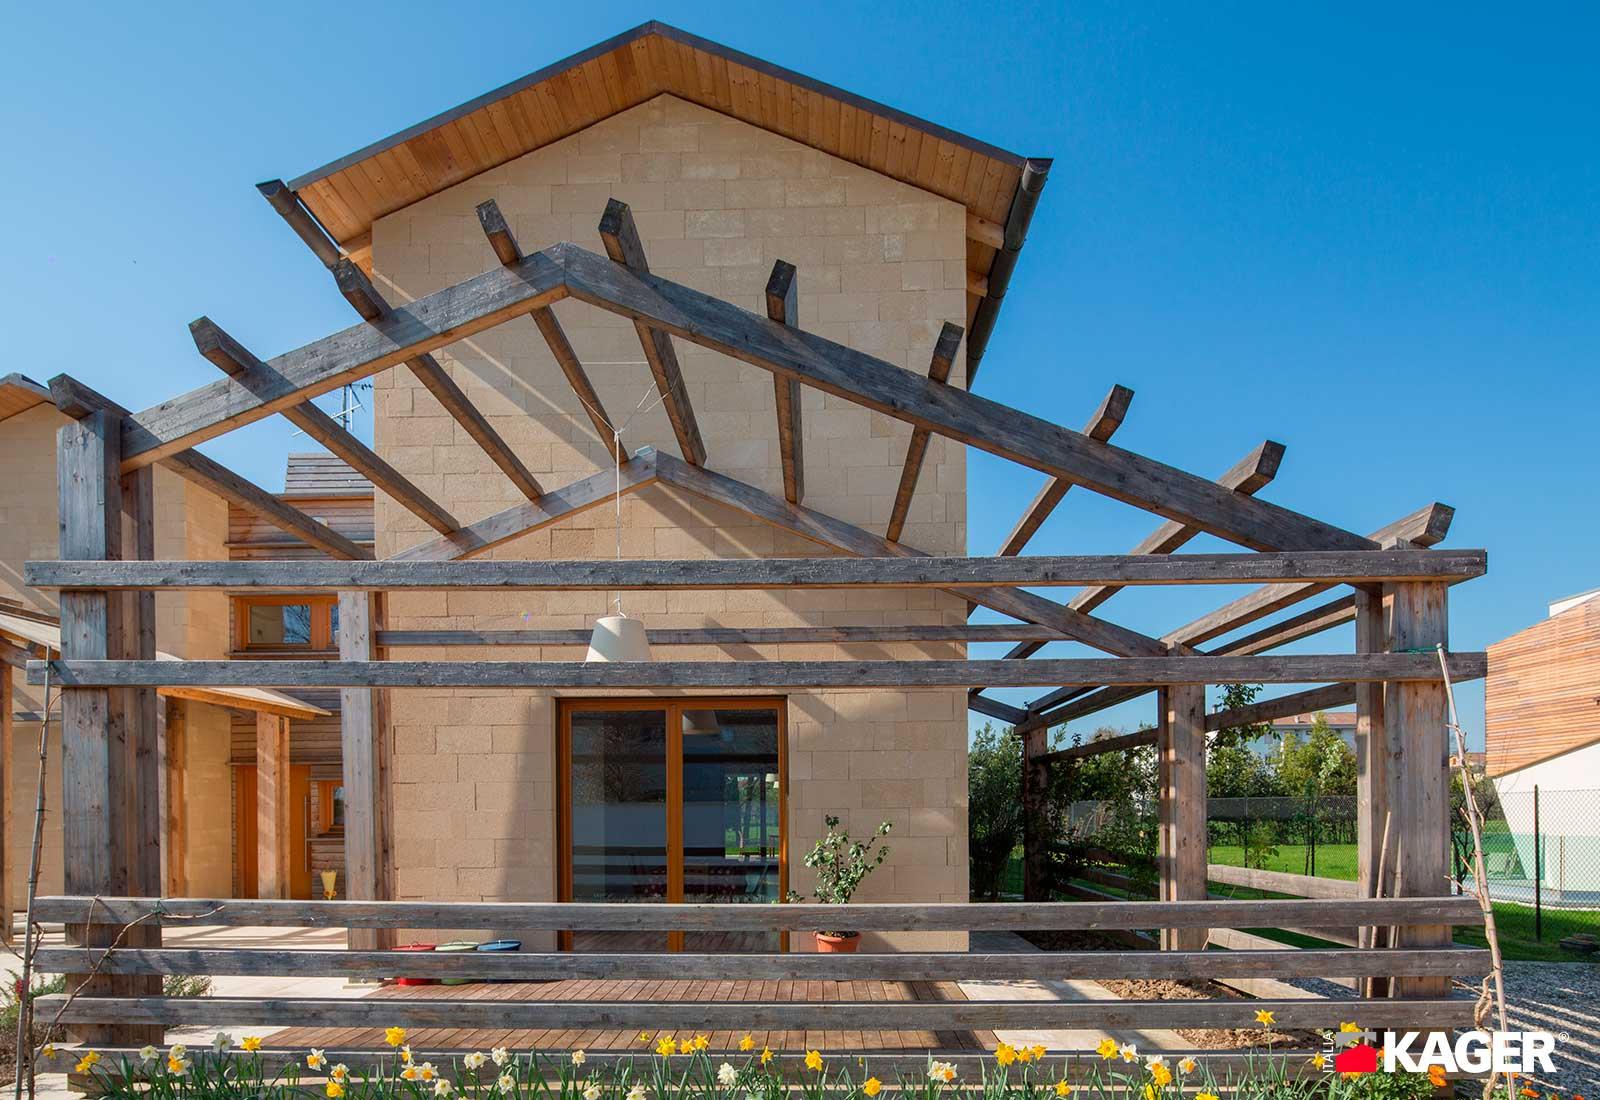 Casa-in-legno-Forli-Kager-Italia-02